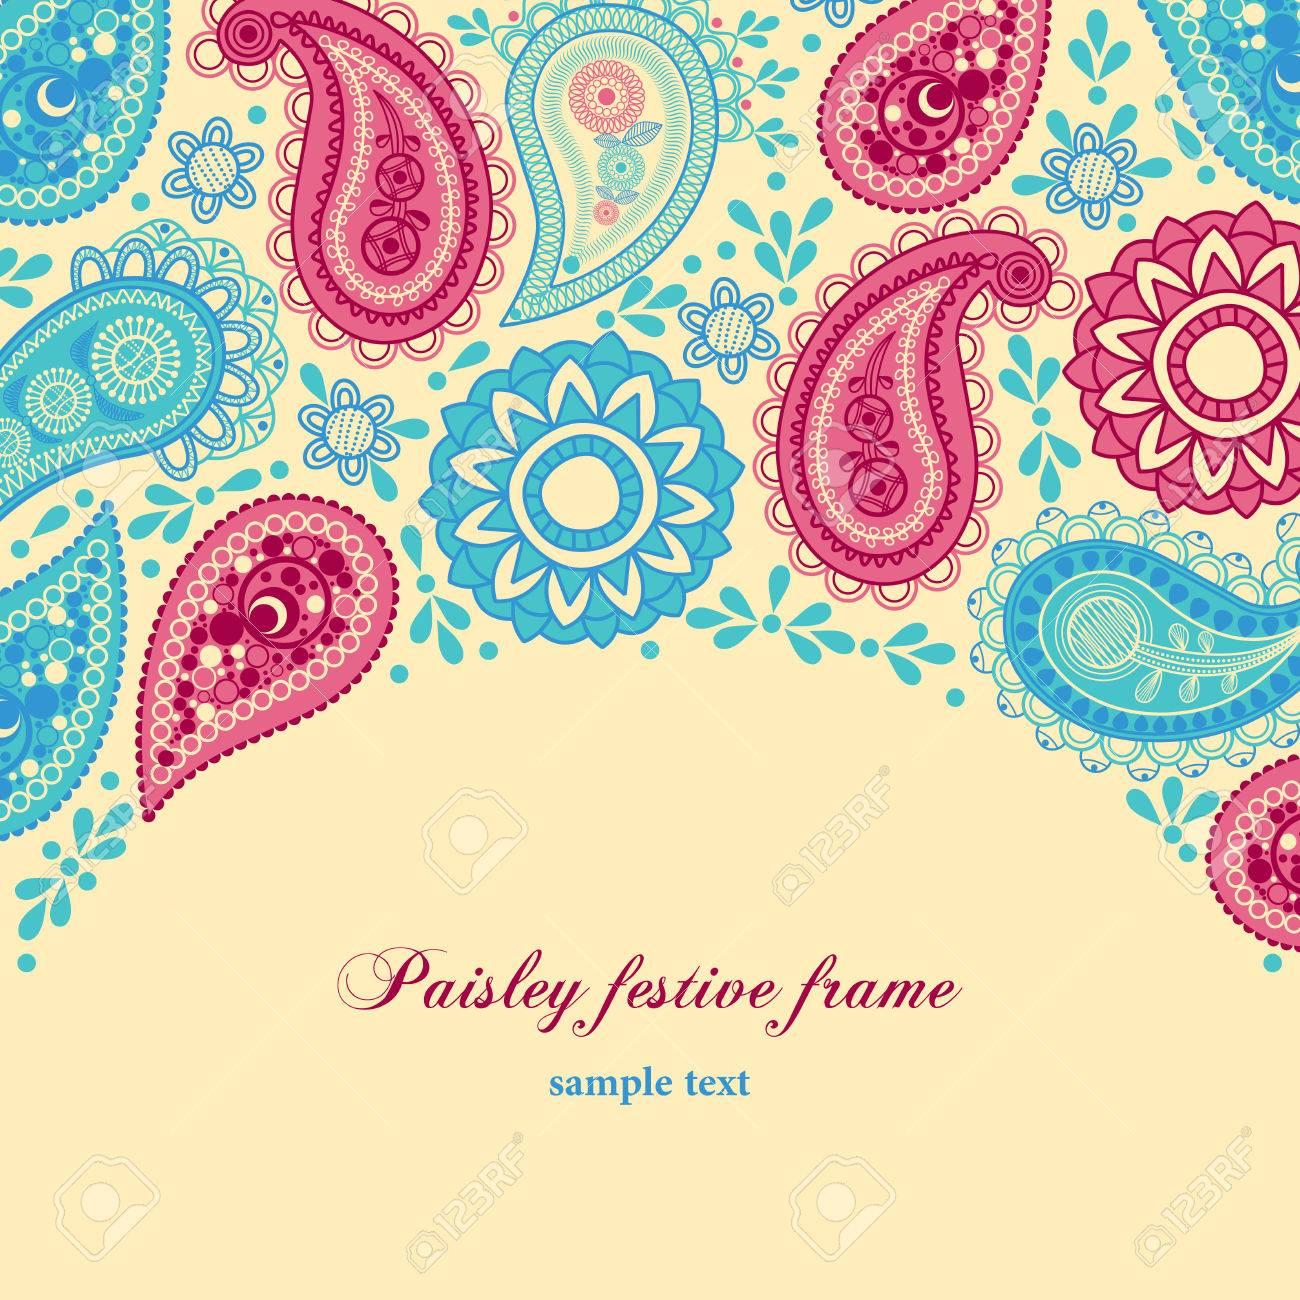 Paisley festive frame Stock Vector - 9056349